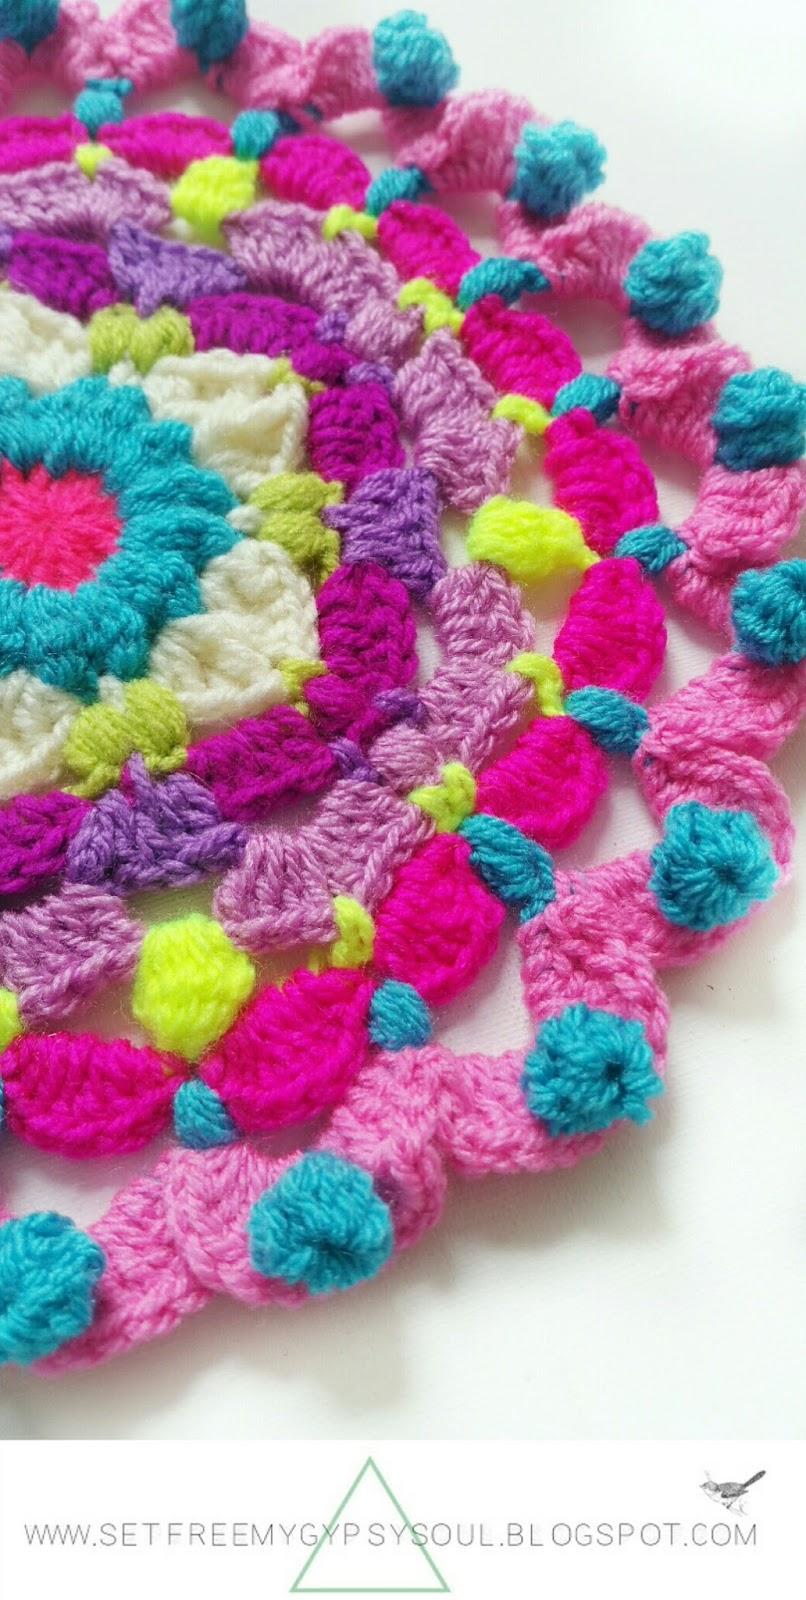 free crochet pattern mandala doily doilie flower hippie boho peggy pink